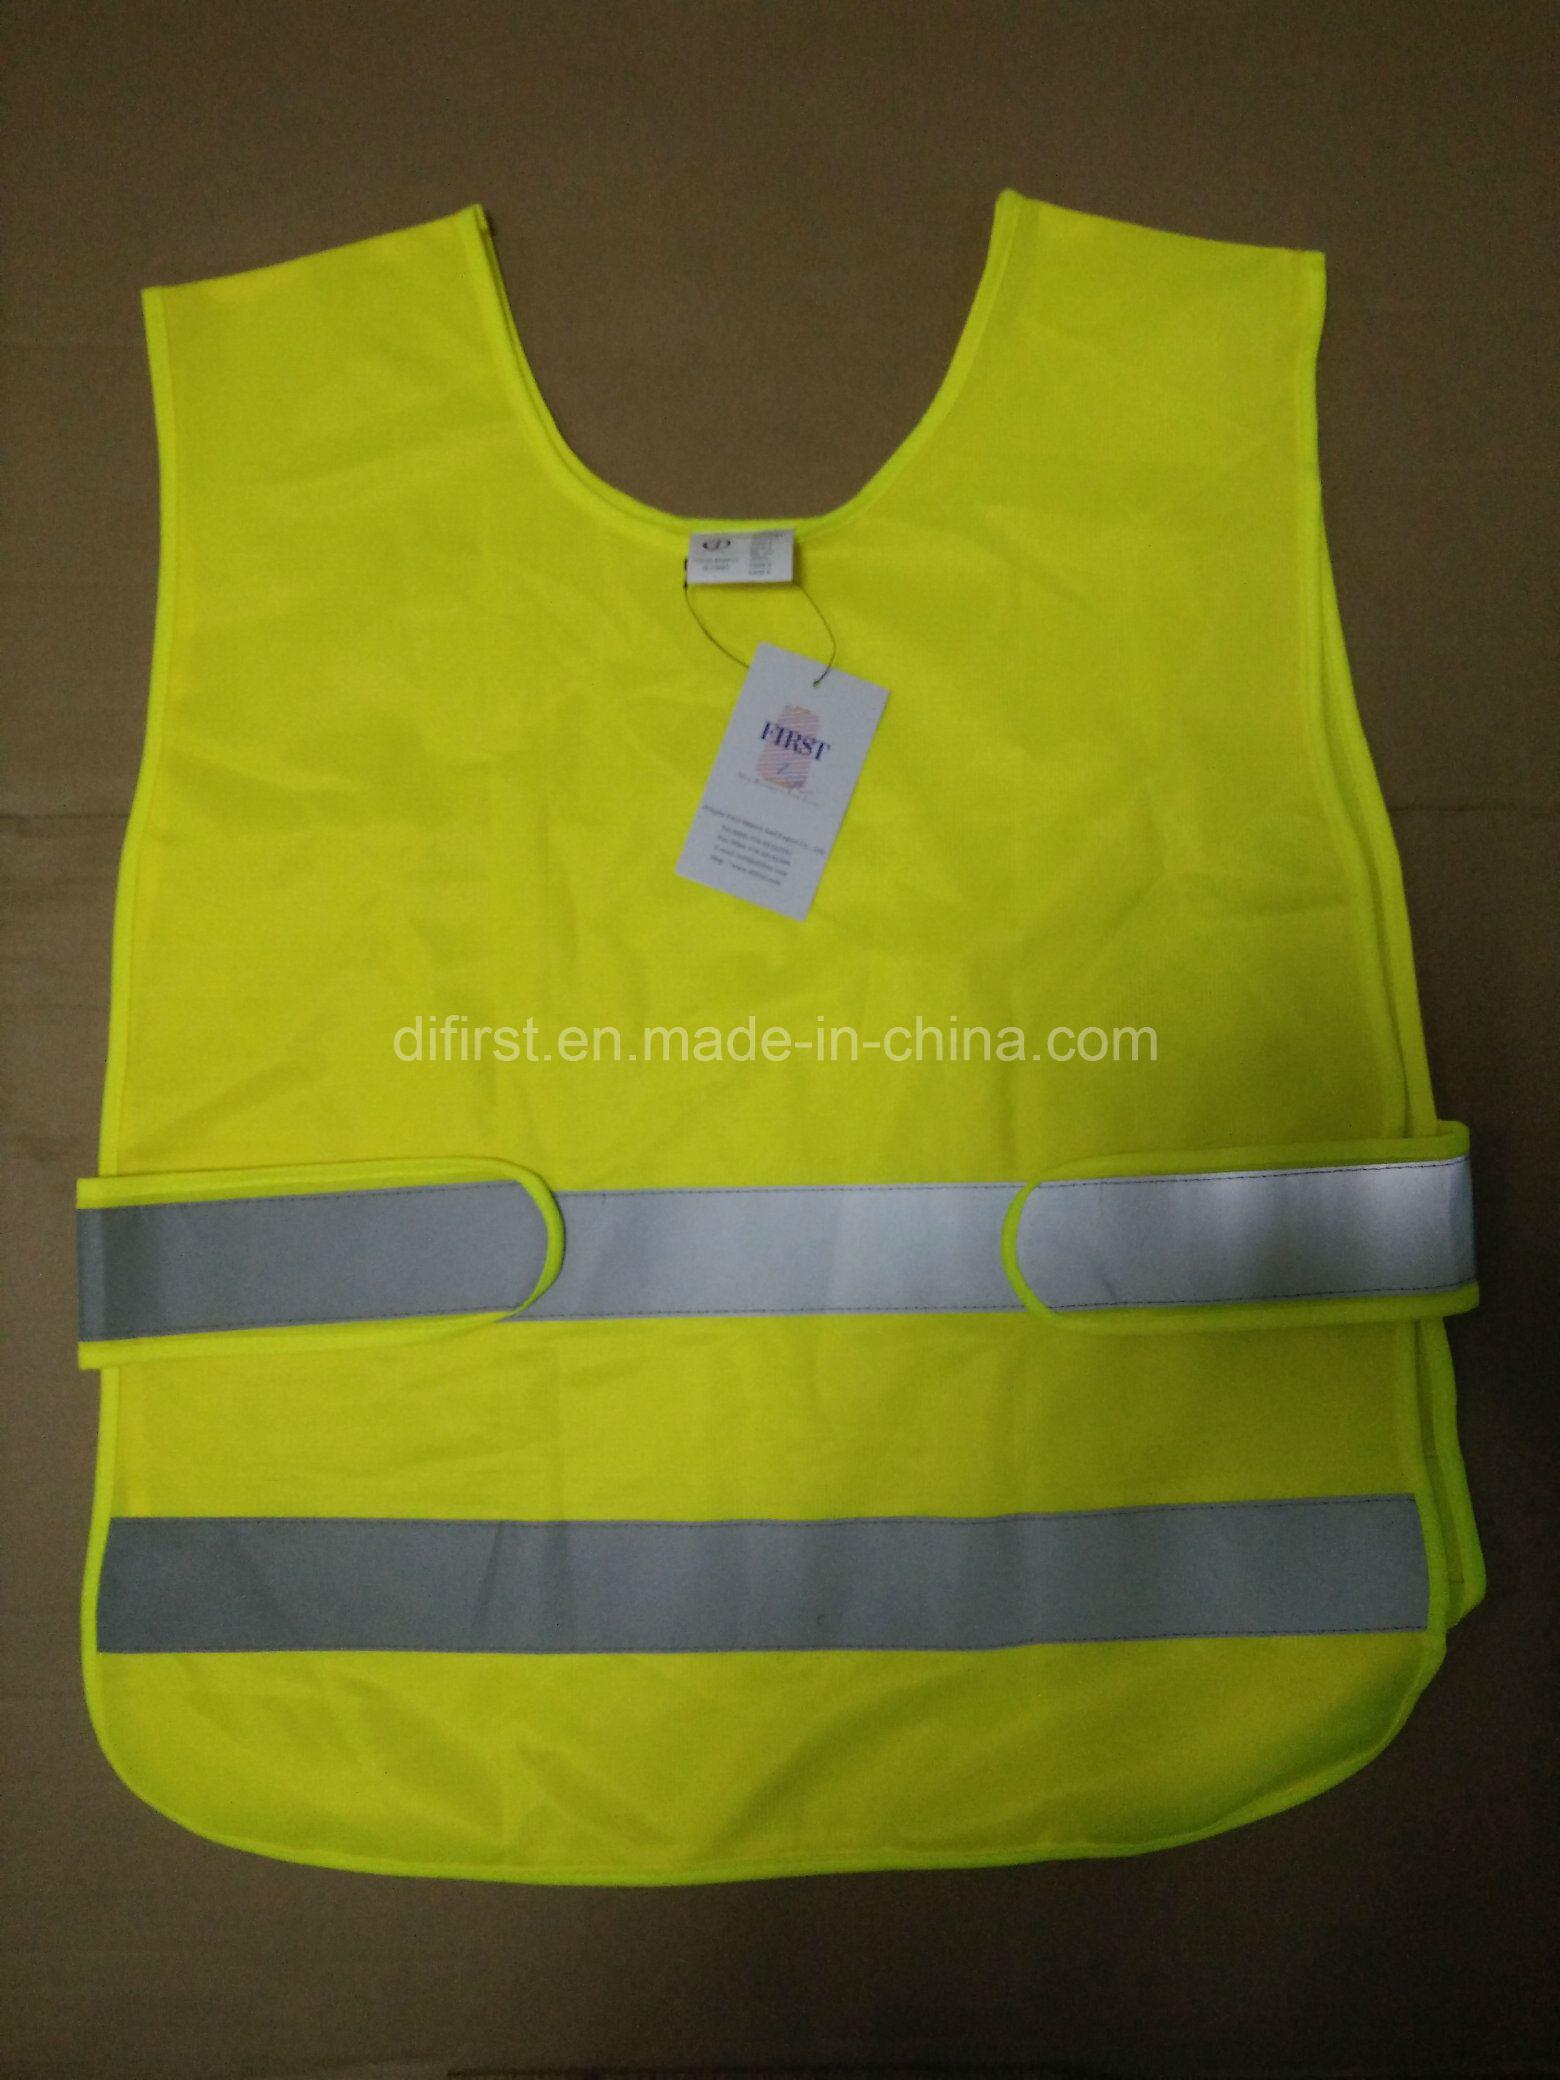 [Hot Item] Hot Salling Safety Vest with Reflective Tape TUV Rheinland